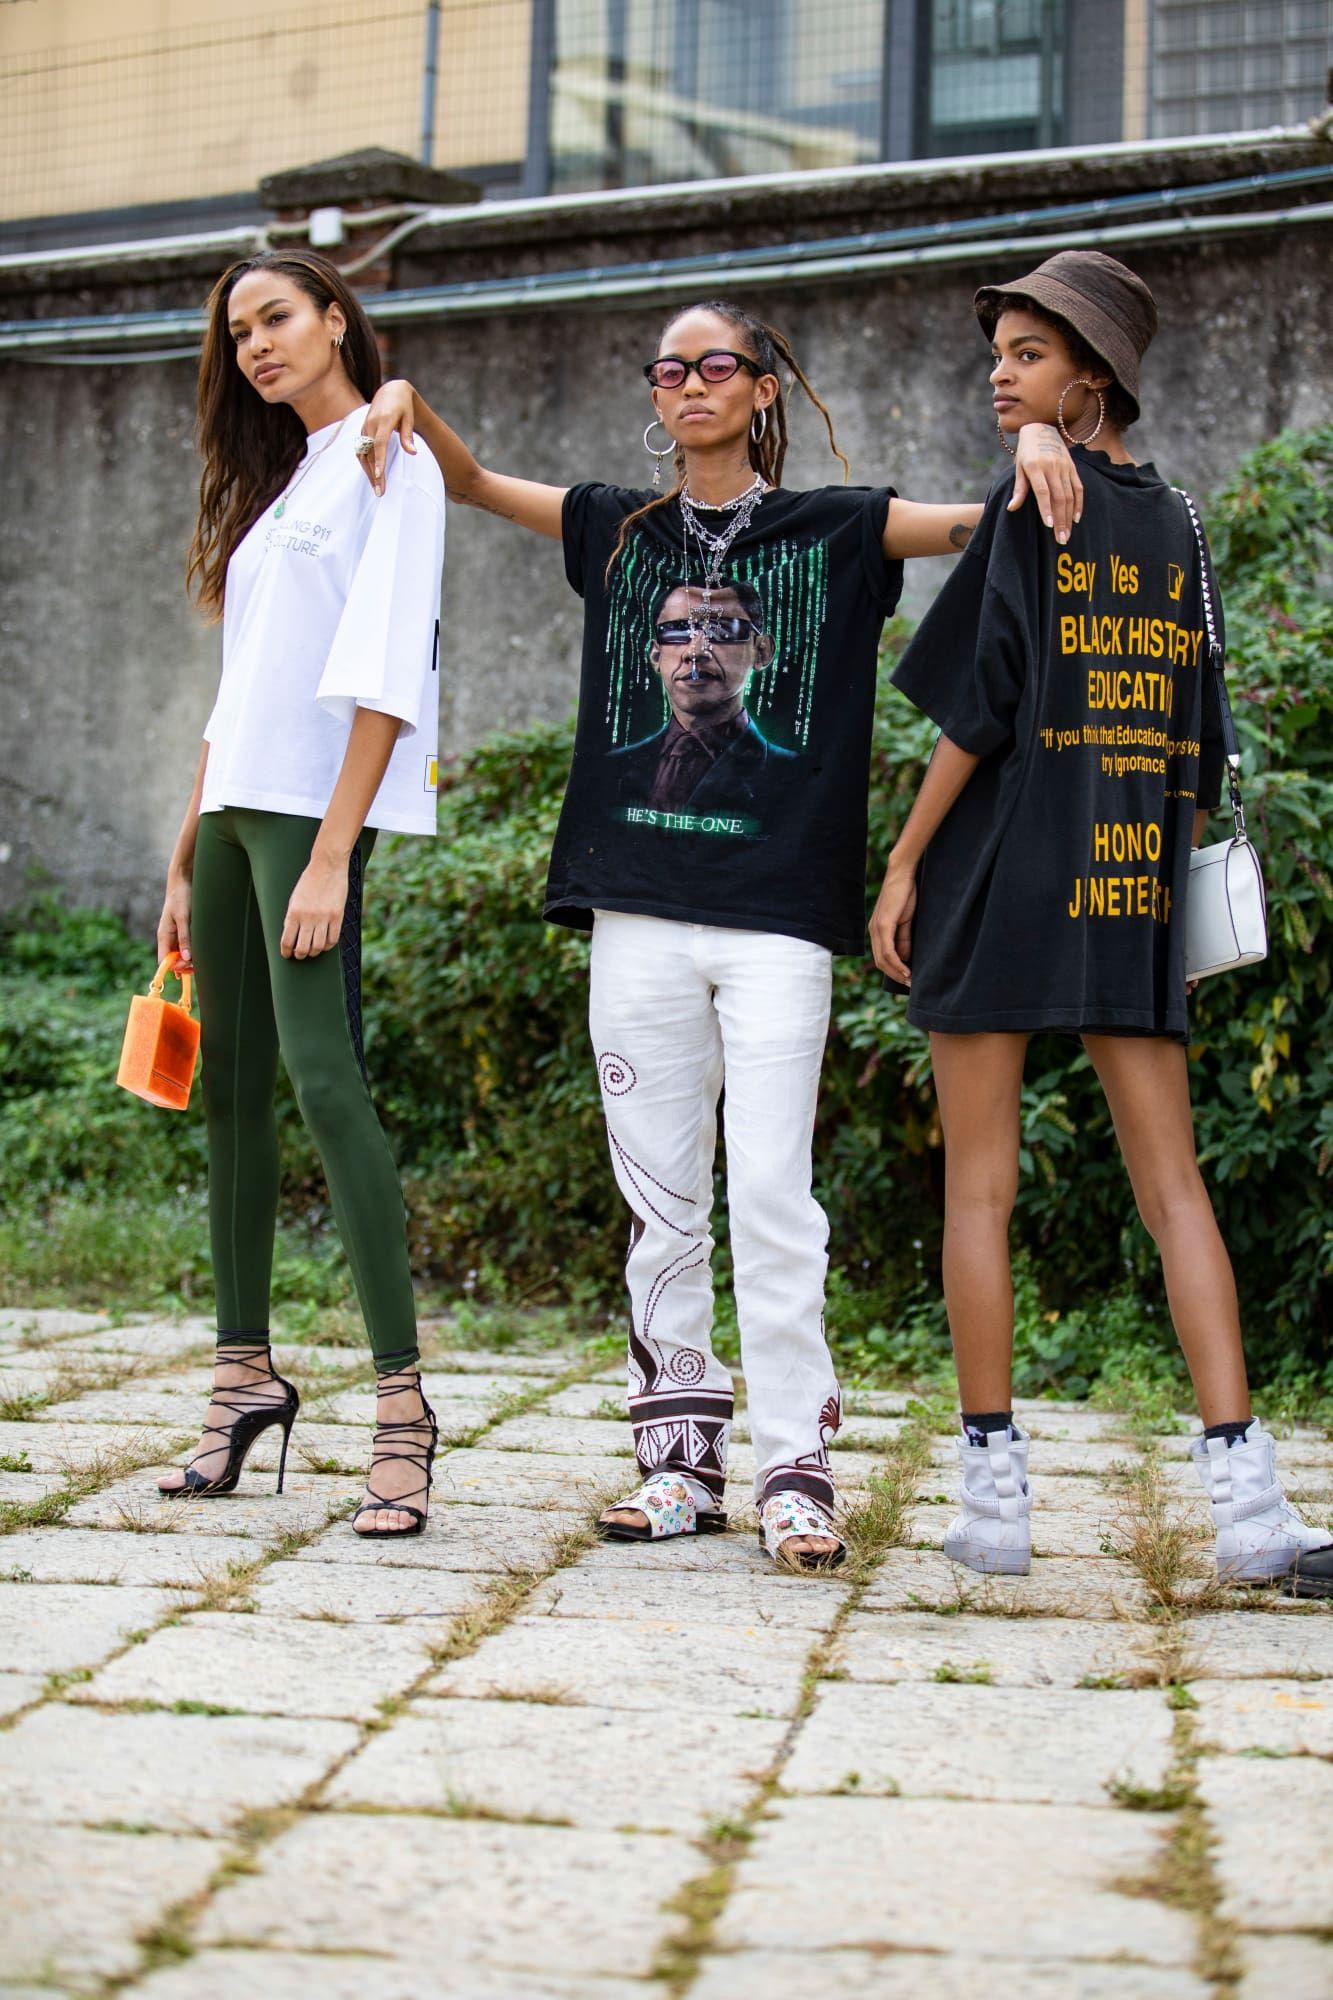 Turtlenecks Were A Street Style Essential On Day 1 Of Paris Fashion Week Cool Street Fashion Milan Fashion Week Street Style Fashion